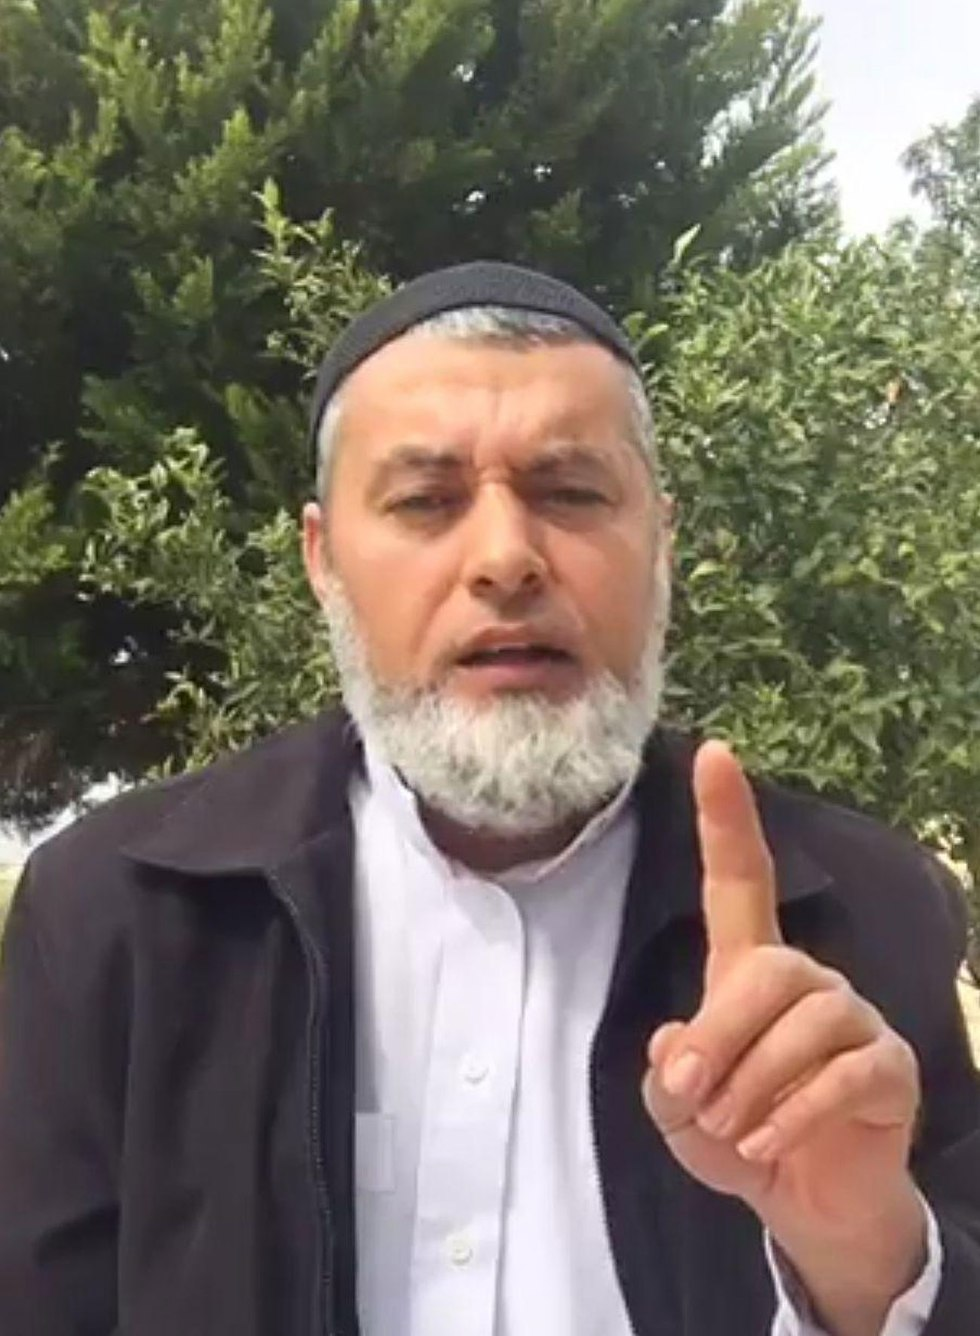 Sheikh Mohammed Sa'ada